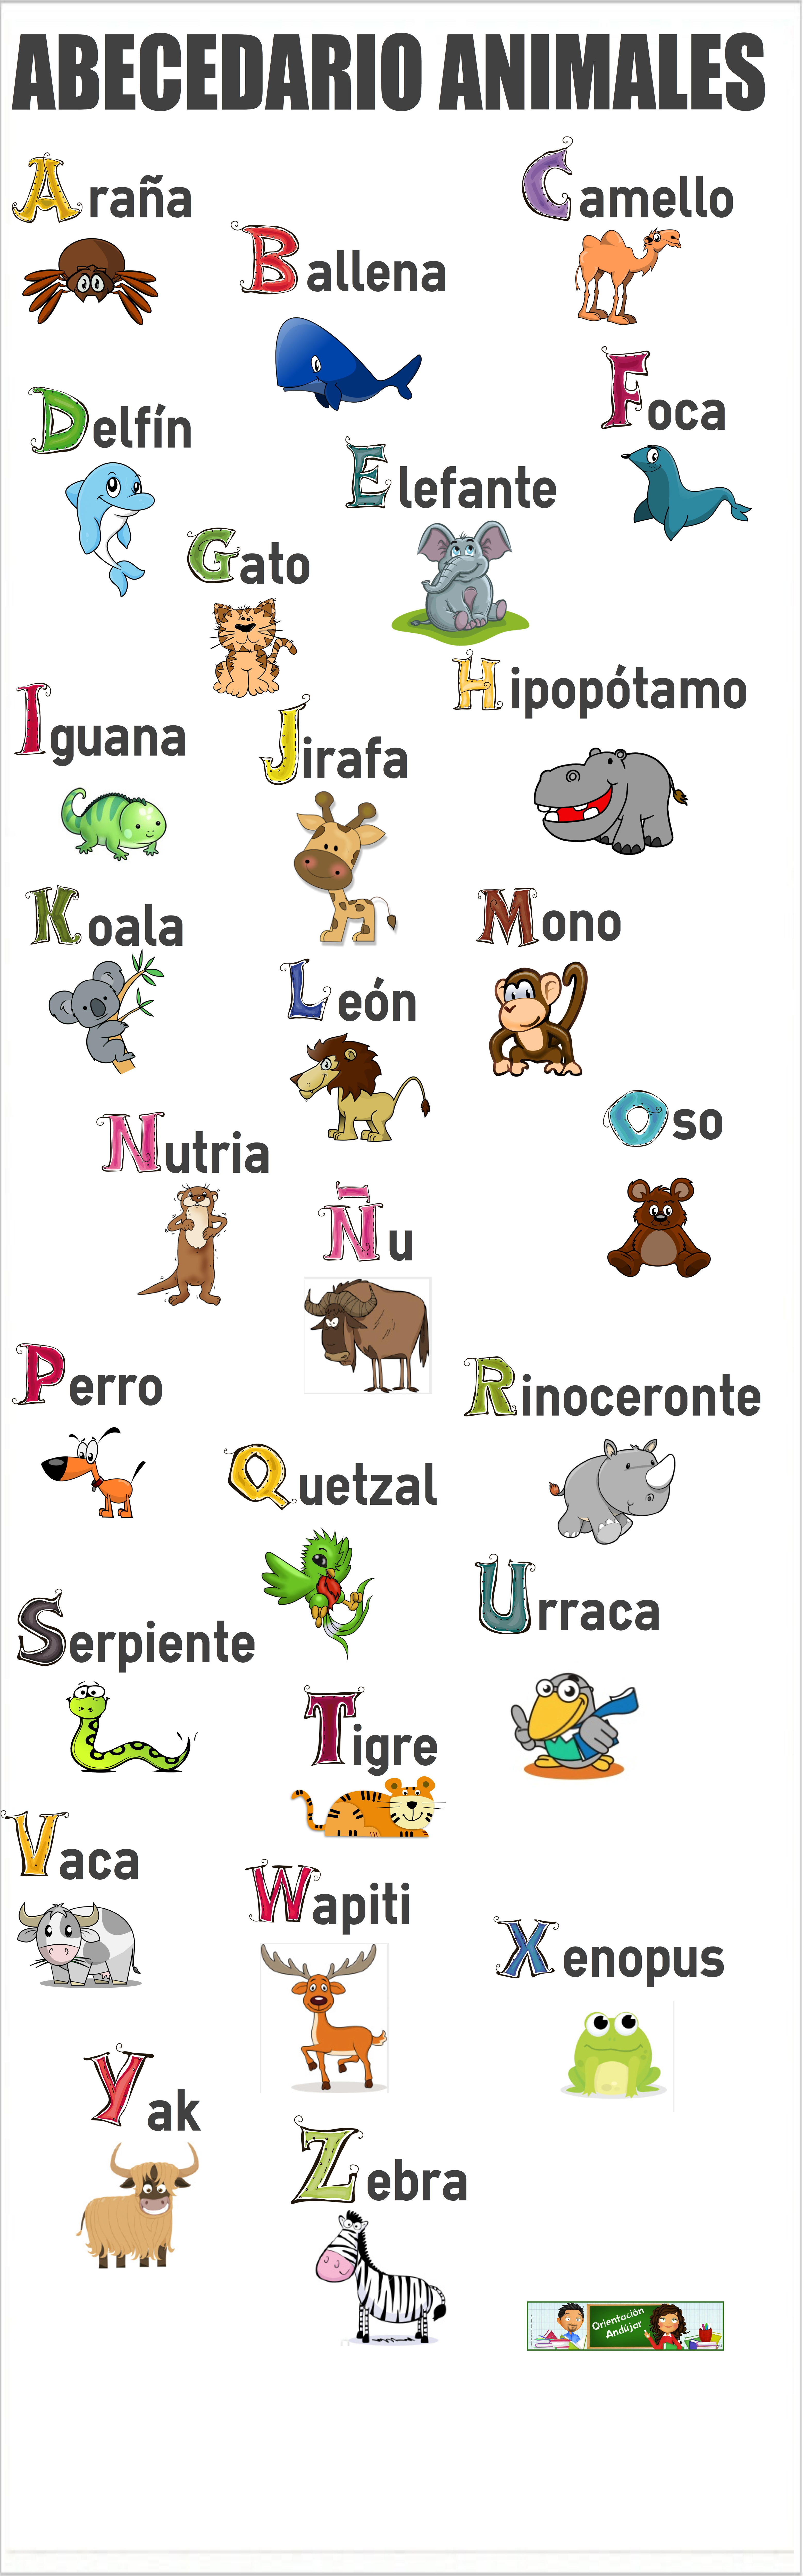 Images About Abecedarios